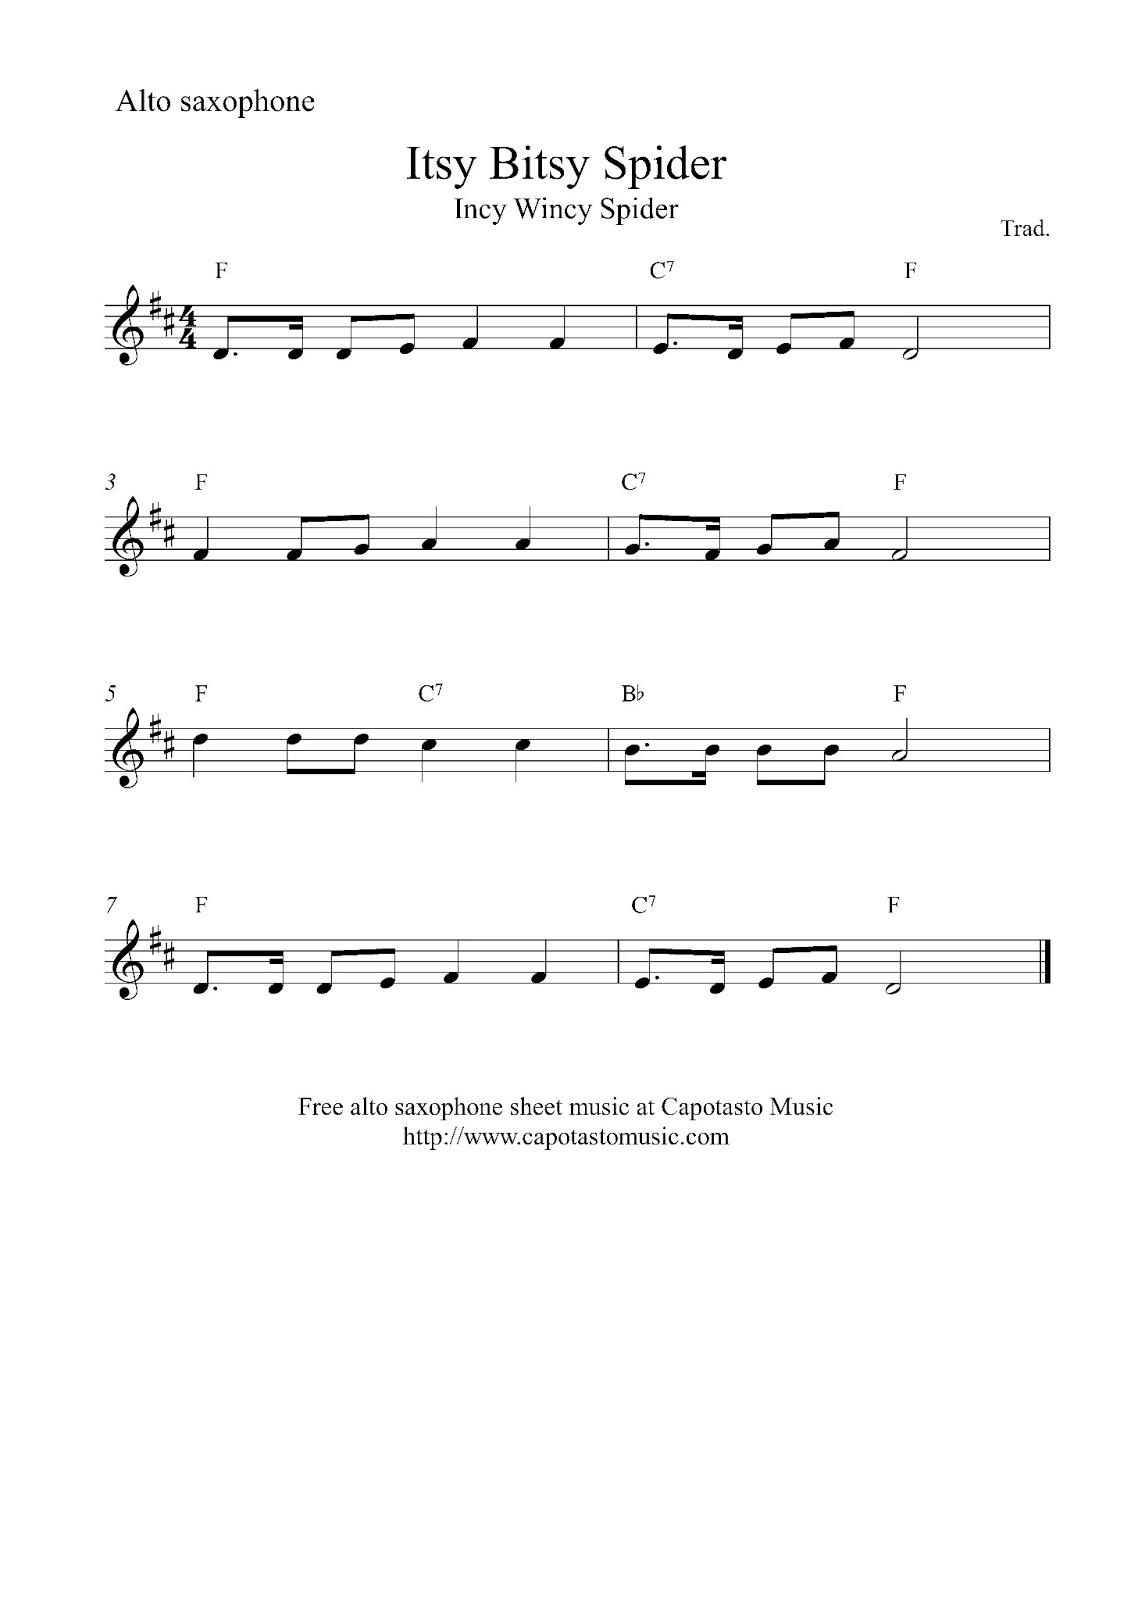 Free easy alto saxophone sheet music, Itsy Bitsy Spider (Incy Wincy Spider) - Itsy Bitsy Spider PNG